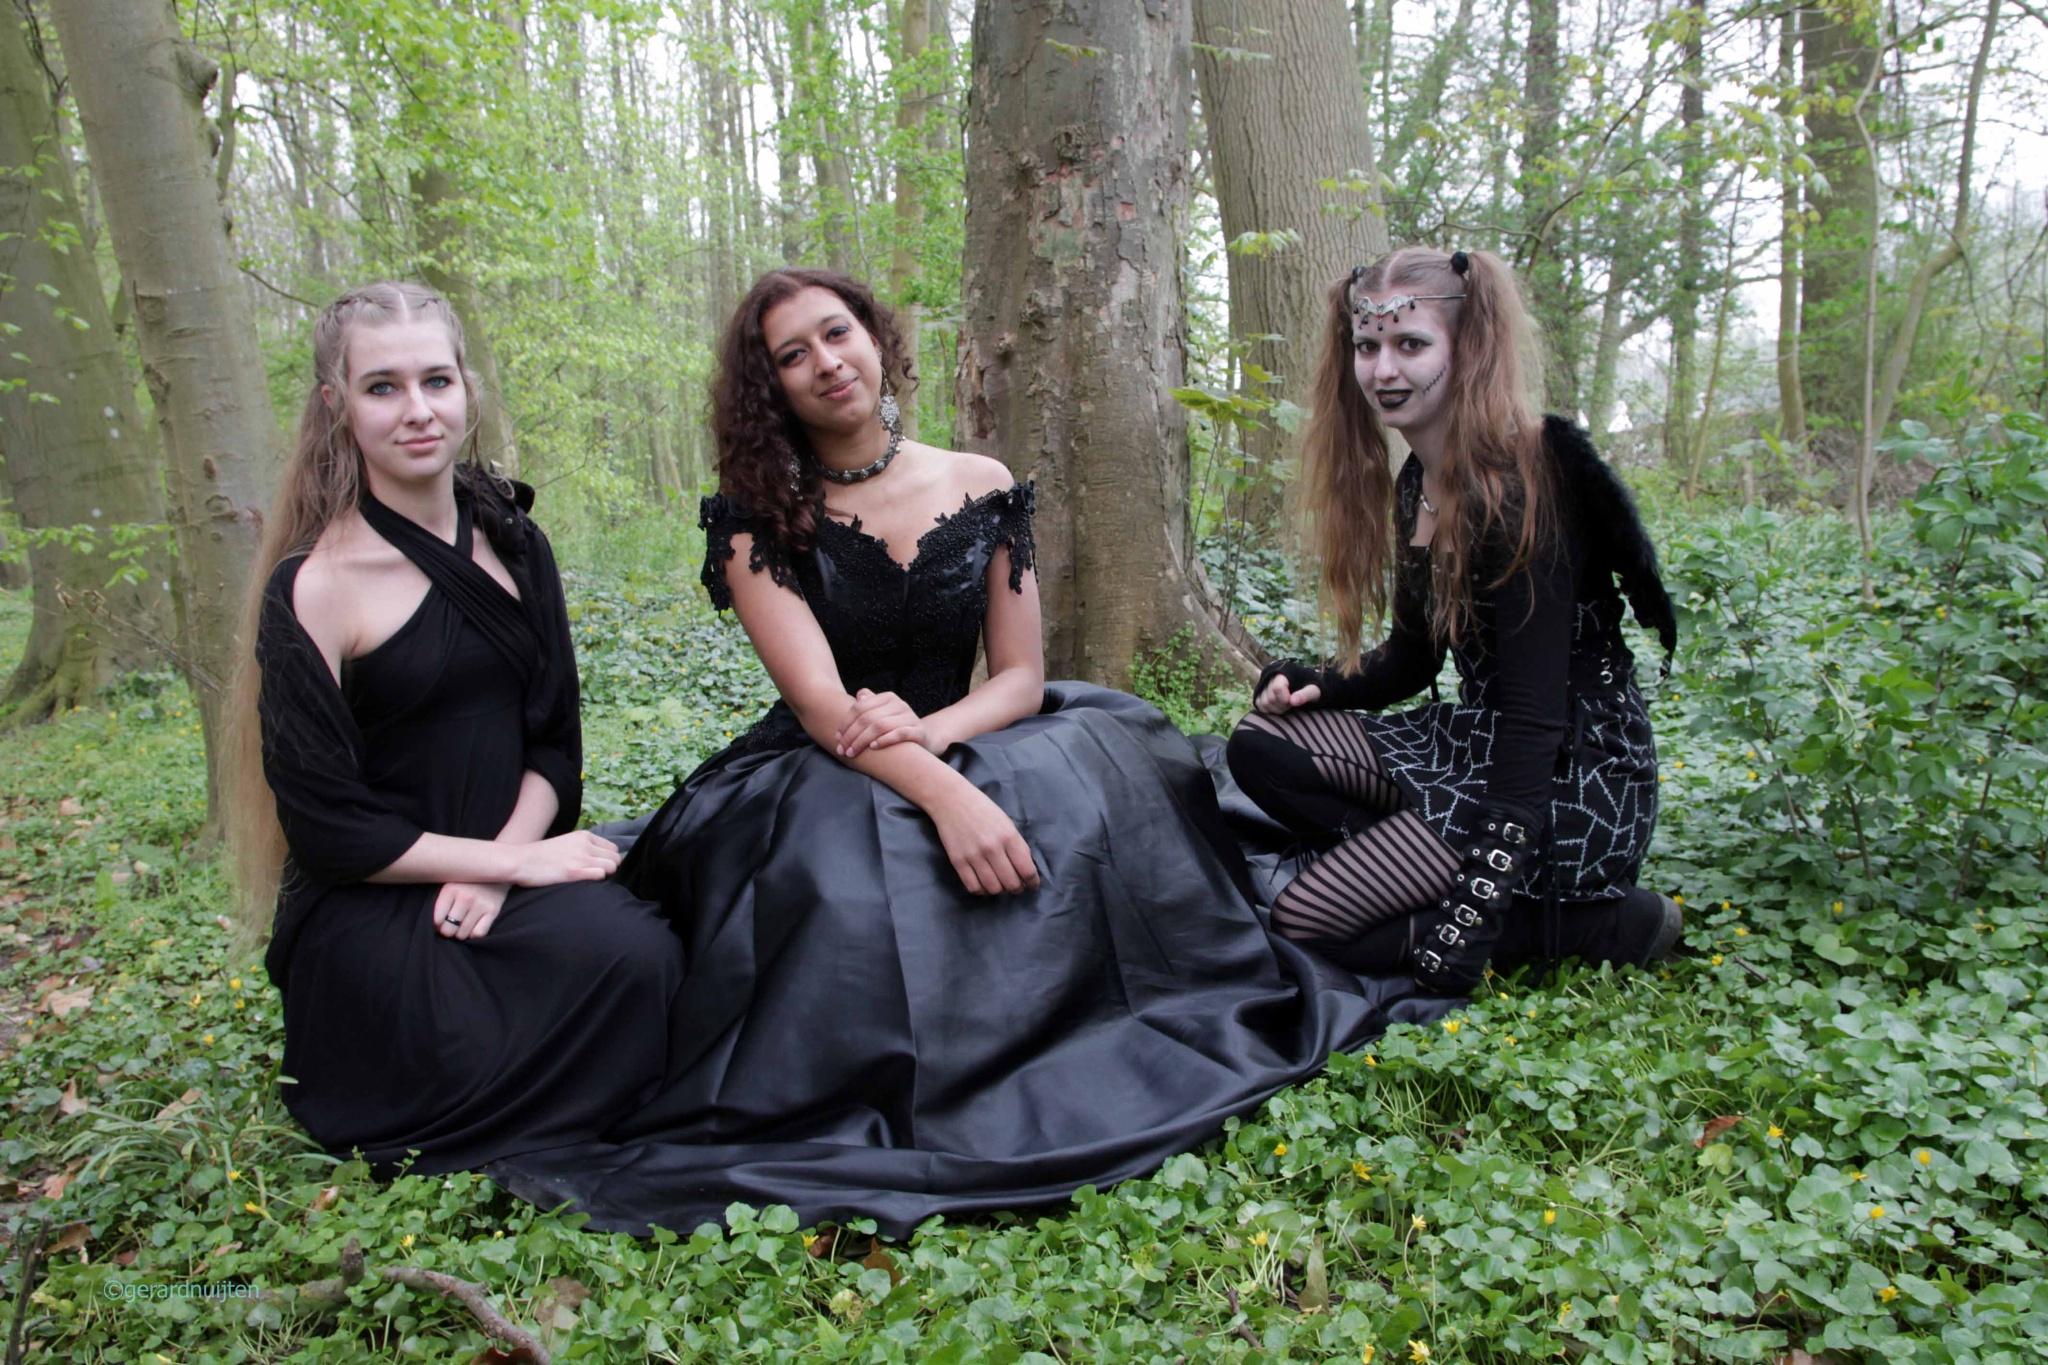 ladies in black . by Gerard Nuijten